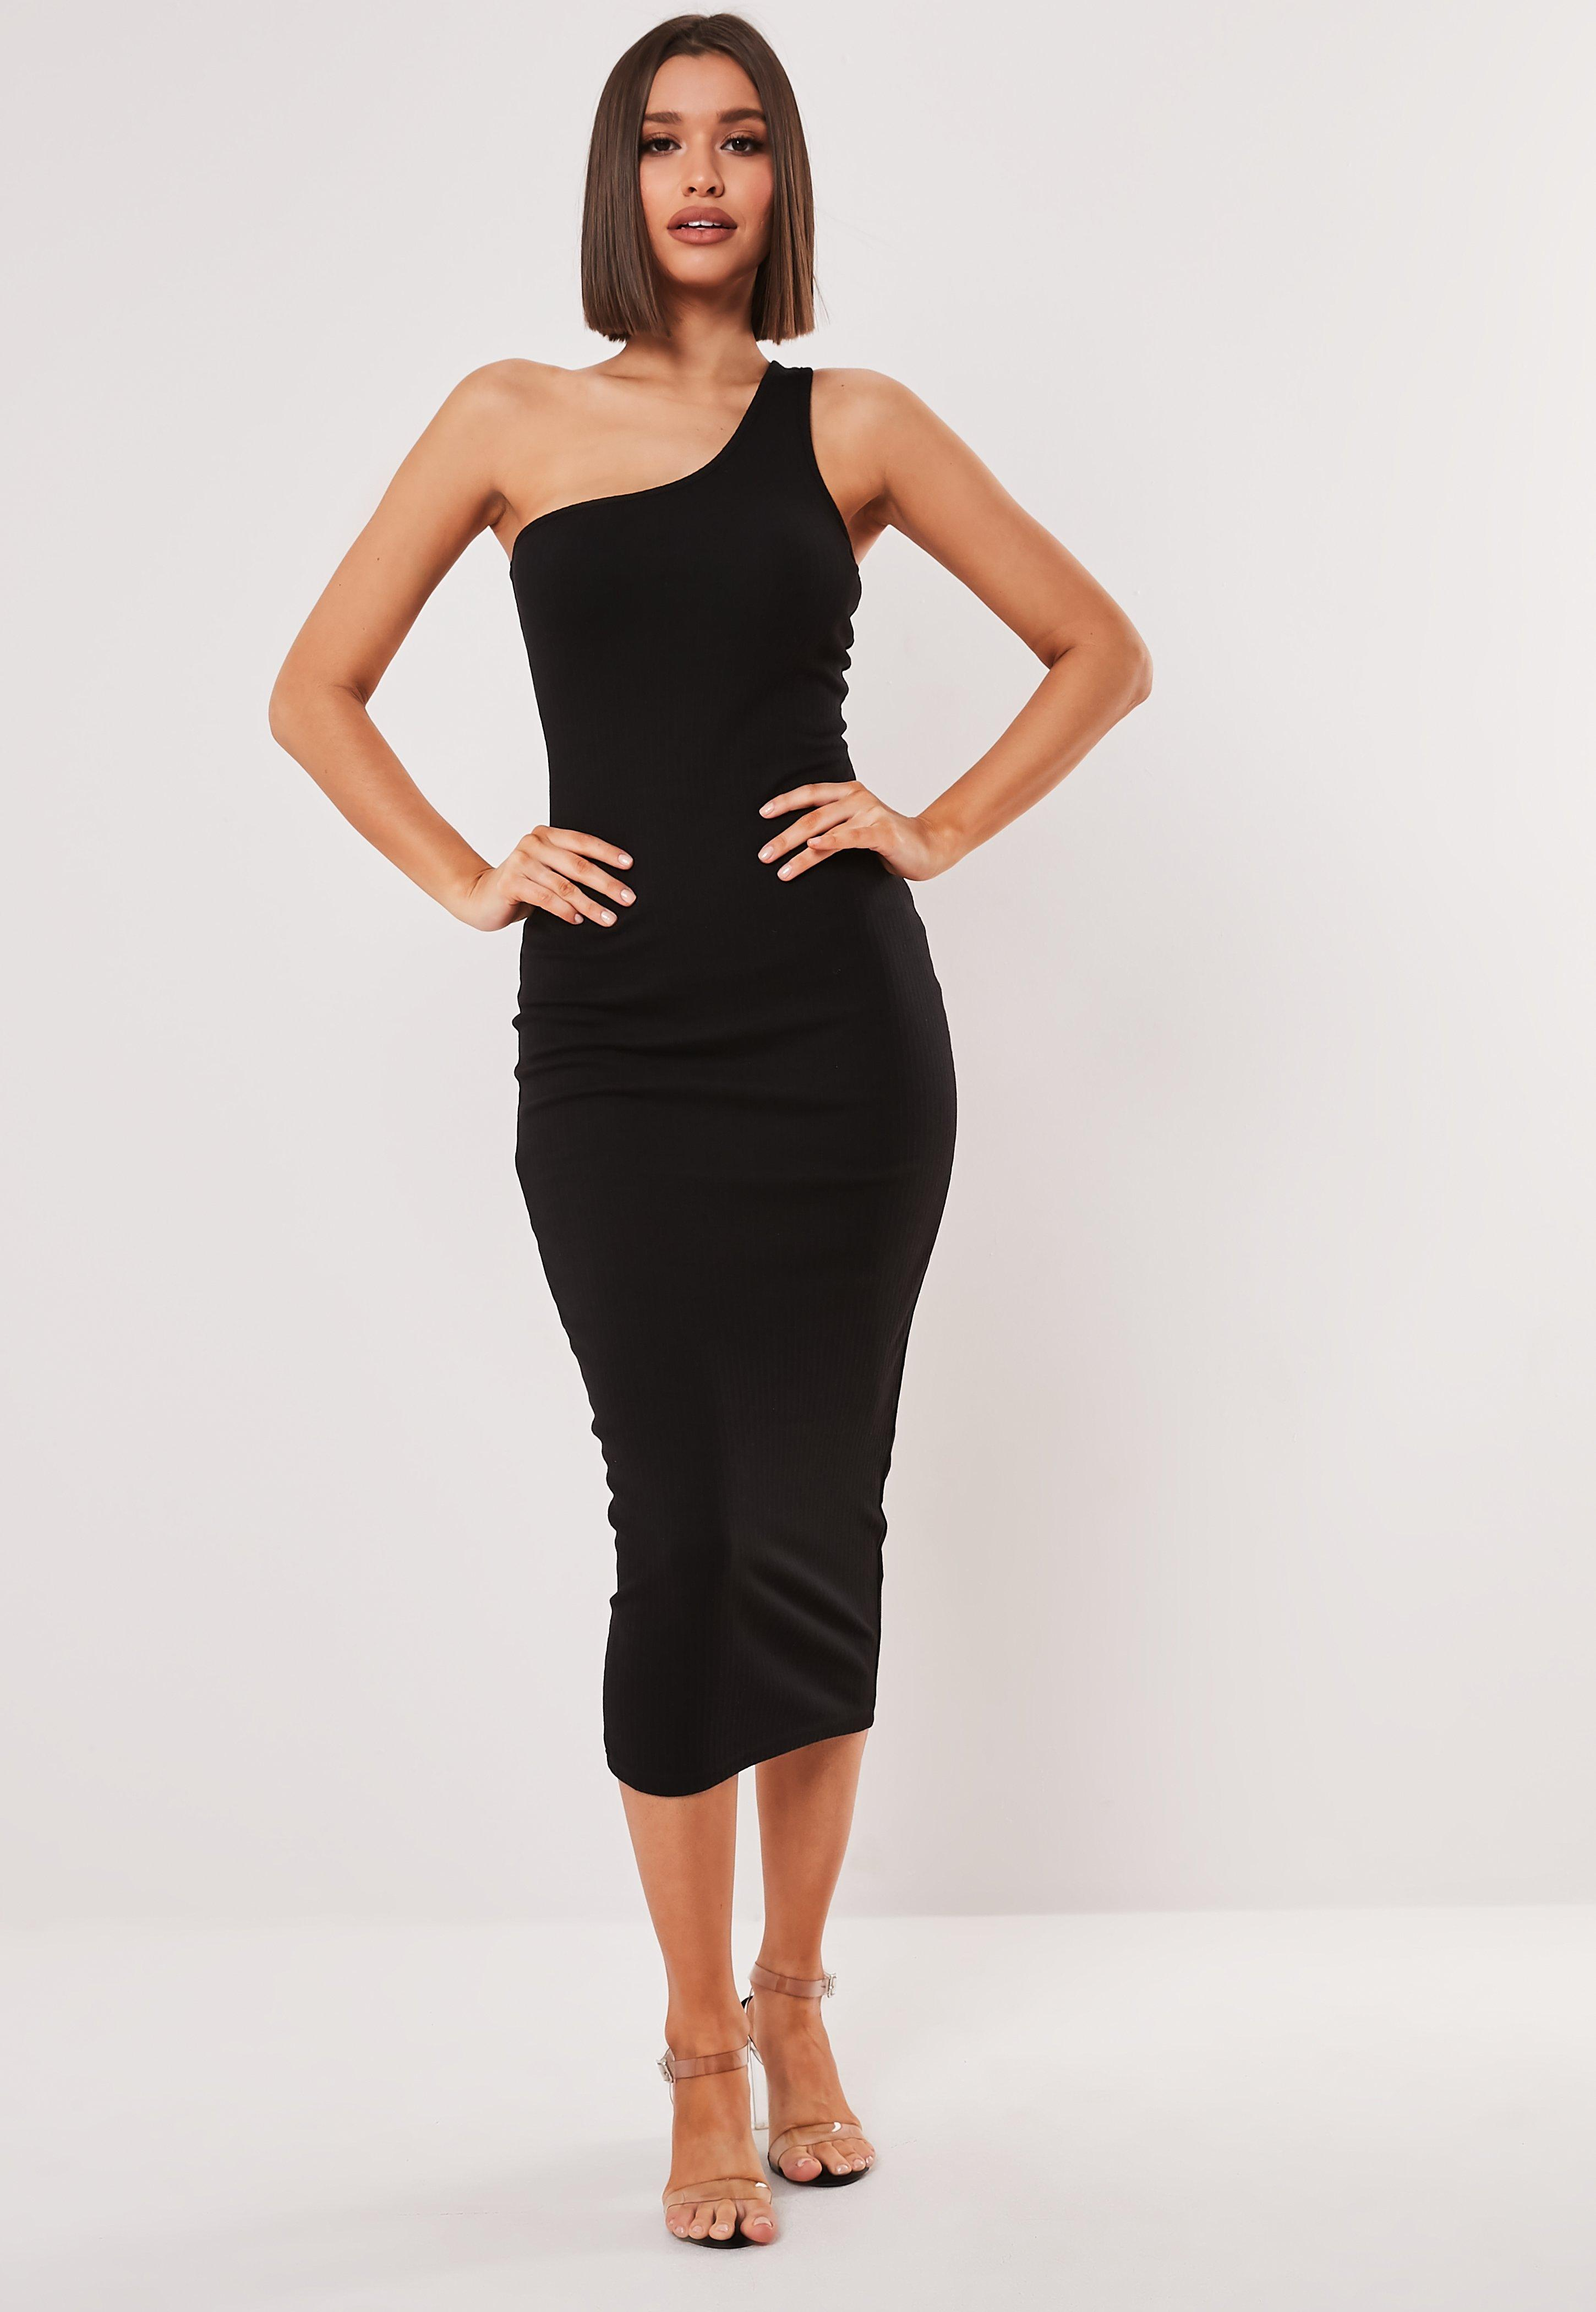 279b33b73d4f5 Little Black Dresses   LBDs & Black Dresses - Missguided Australia